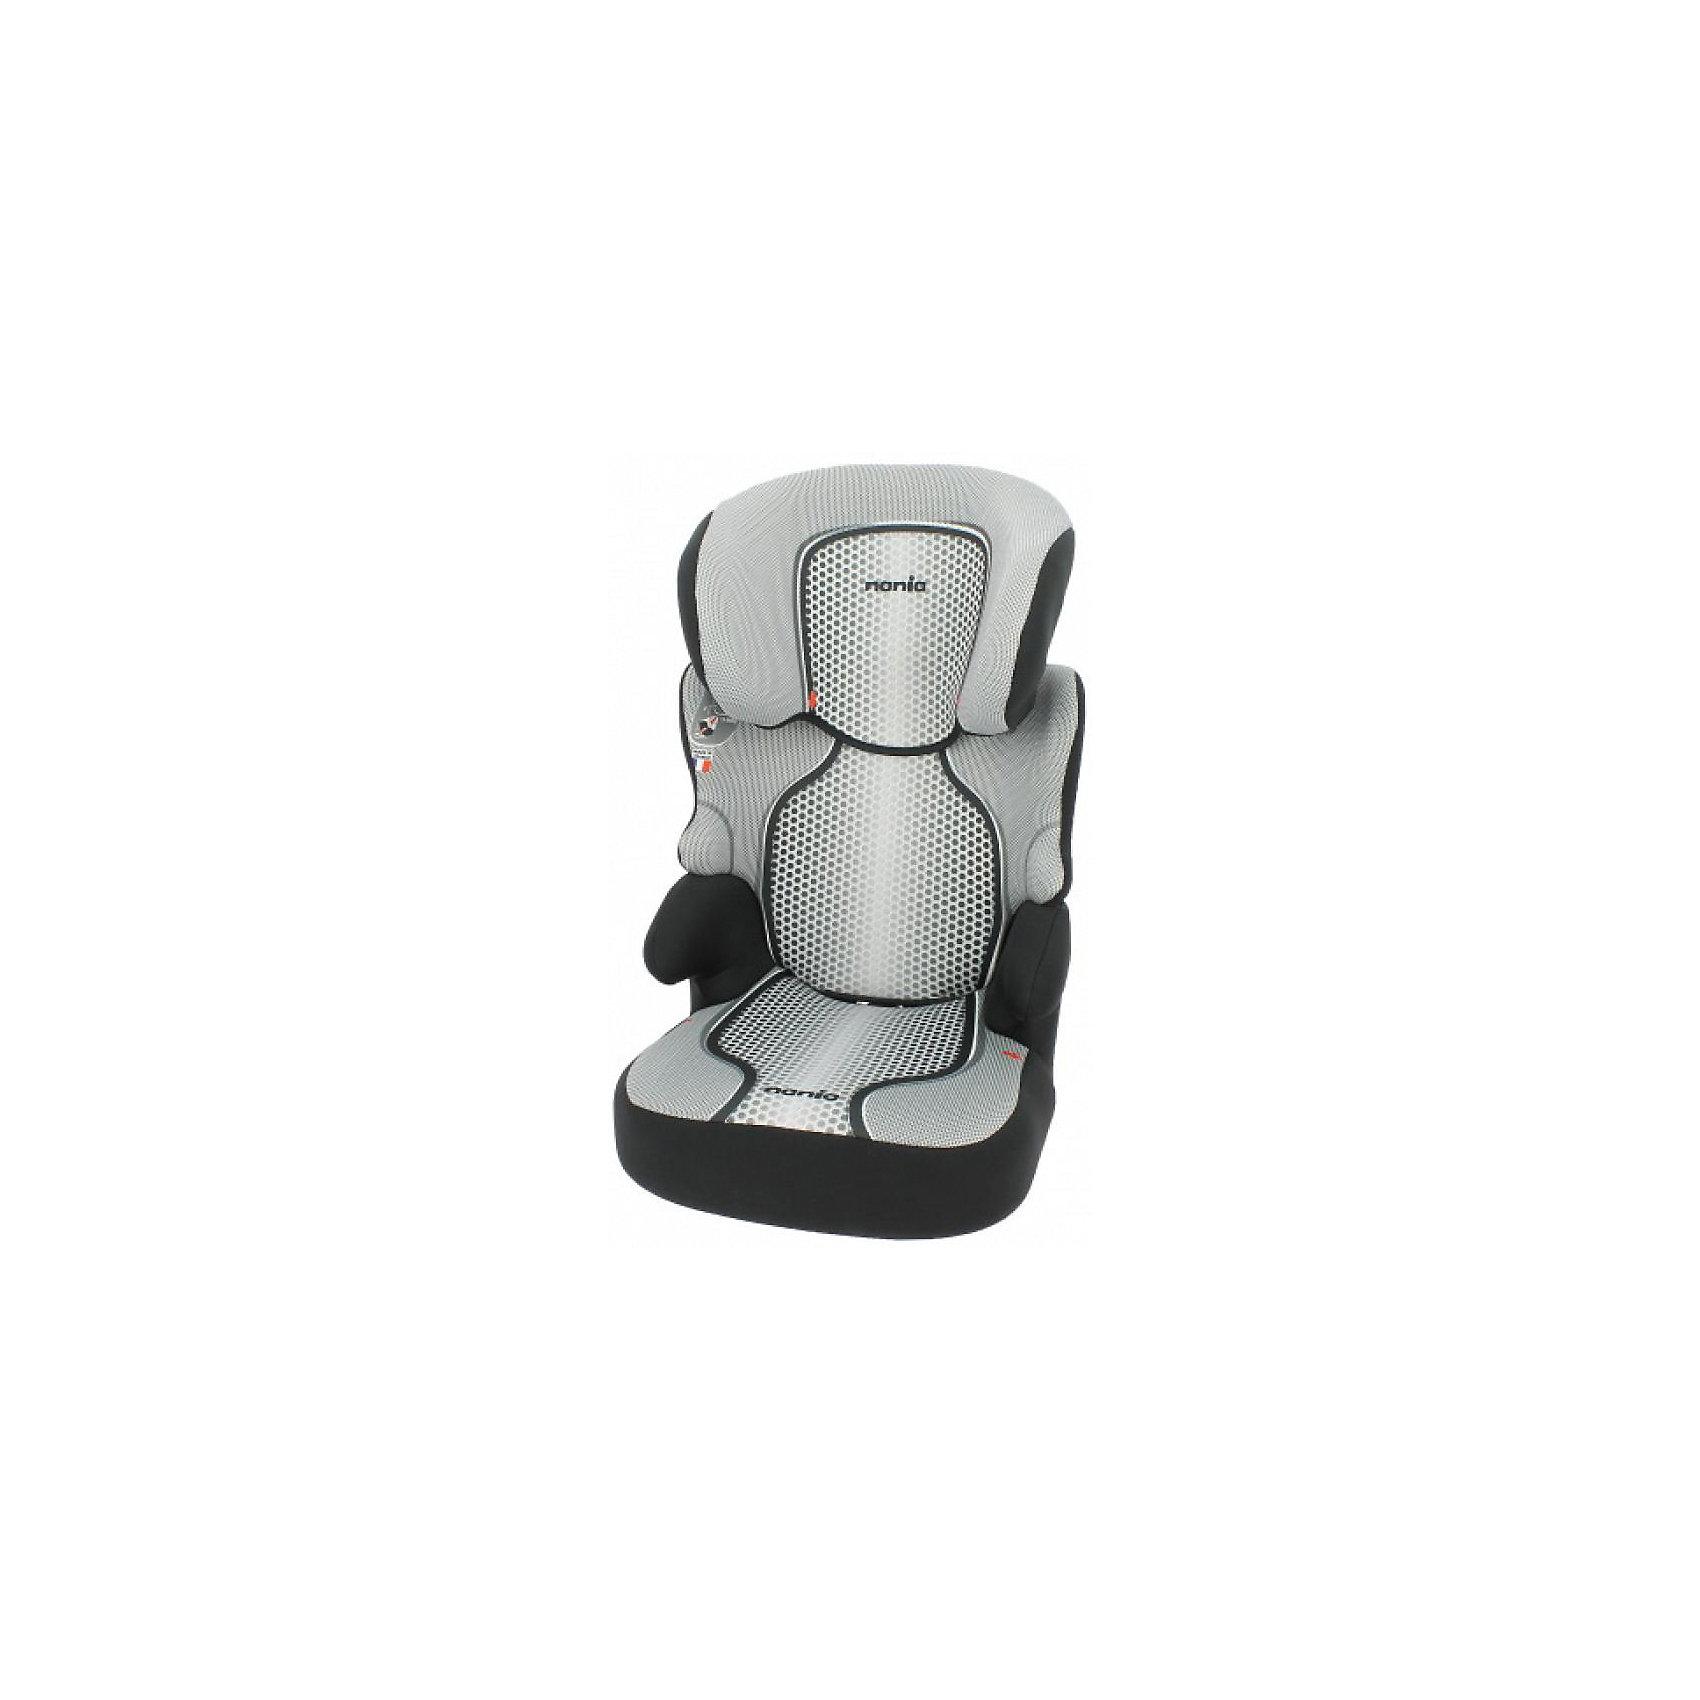 Автокресло Befix SP FST 15-36 кг., Nania, pop black